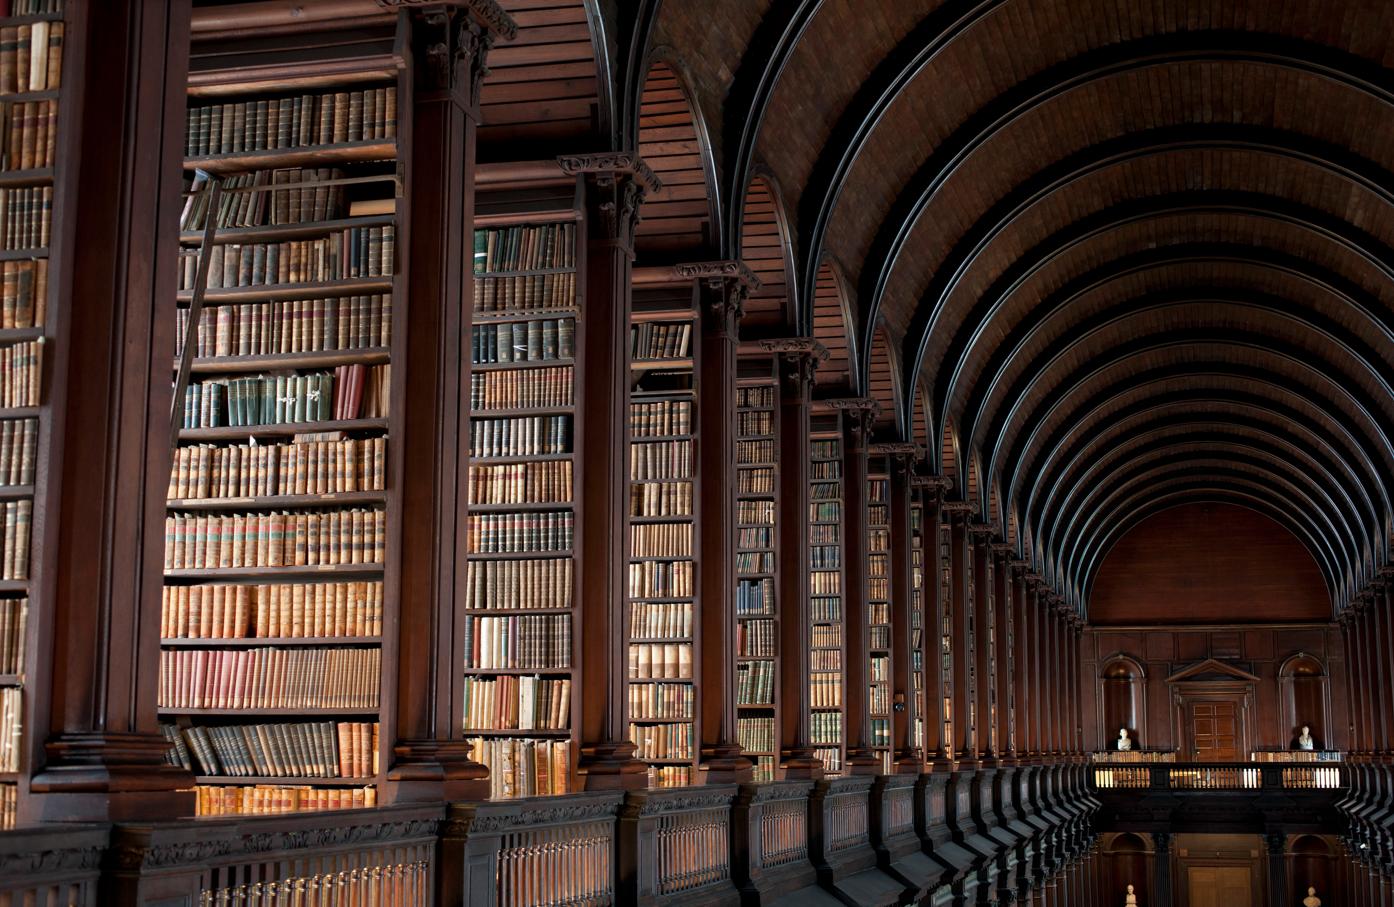 Trinity College Library Dublin Ireland - خیالباف -daydreamer